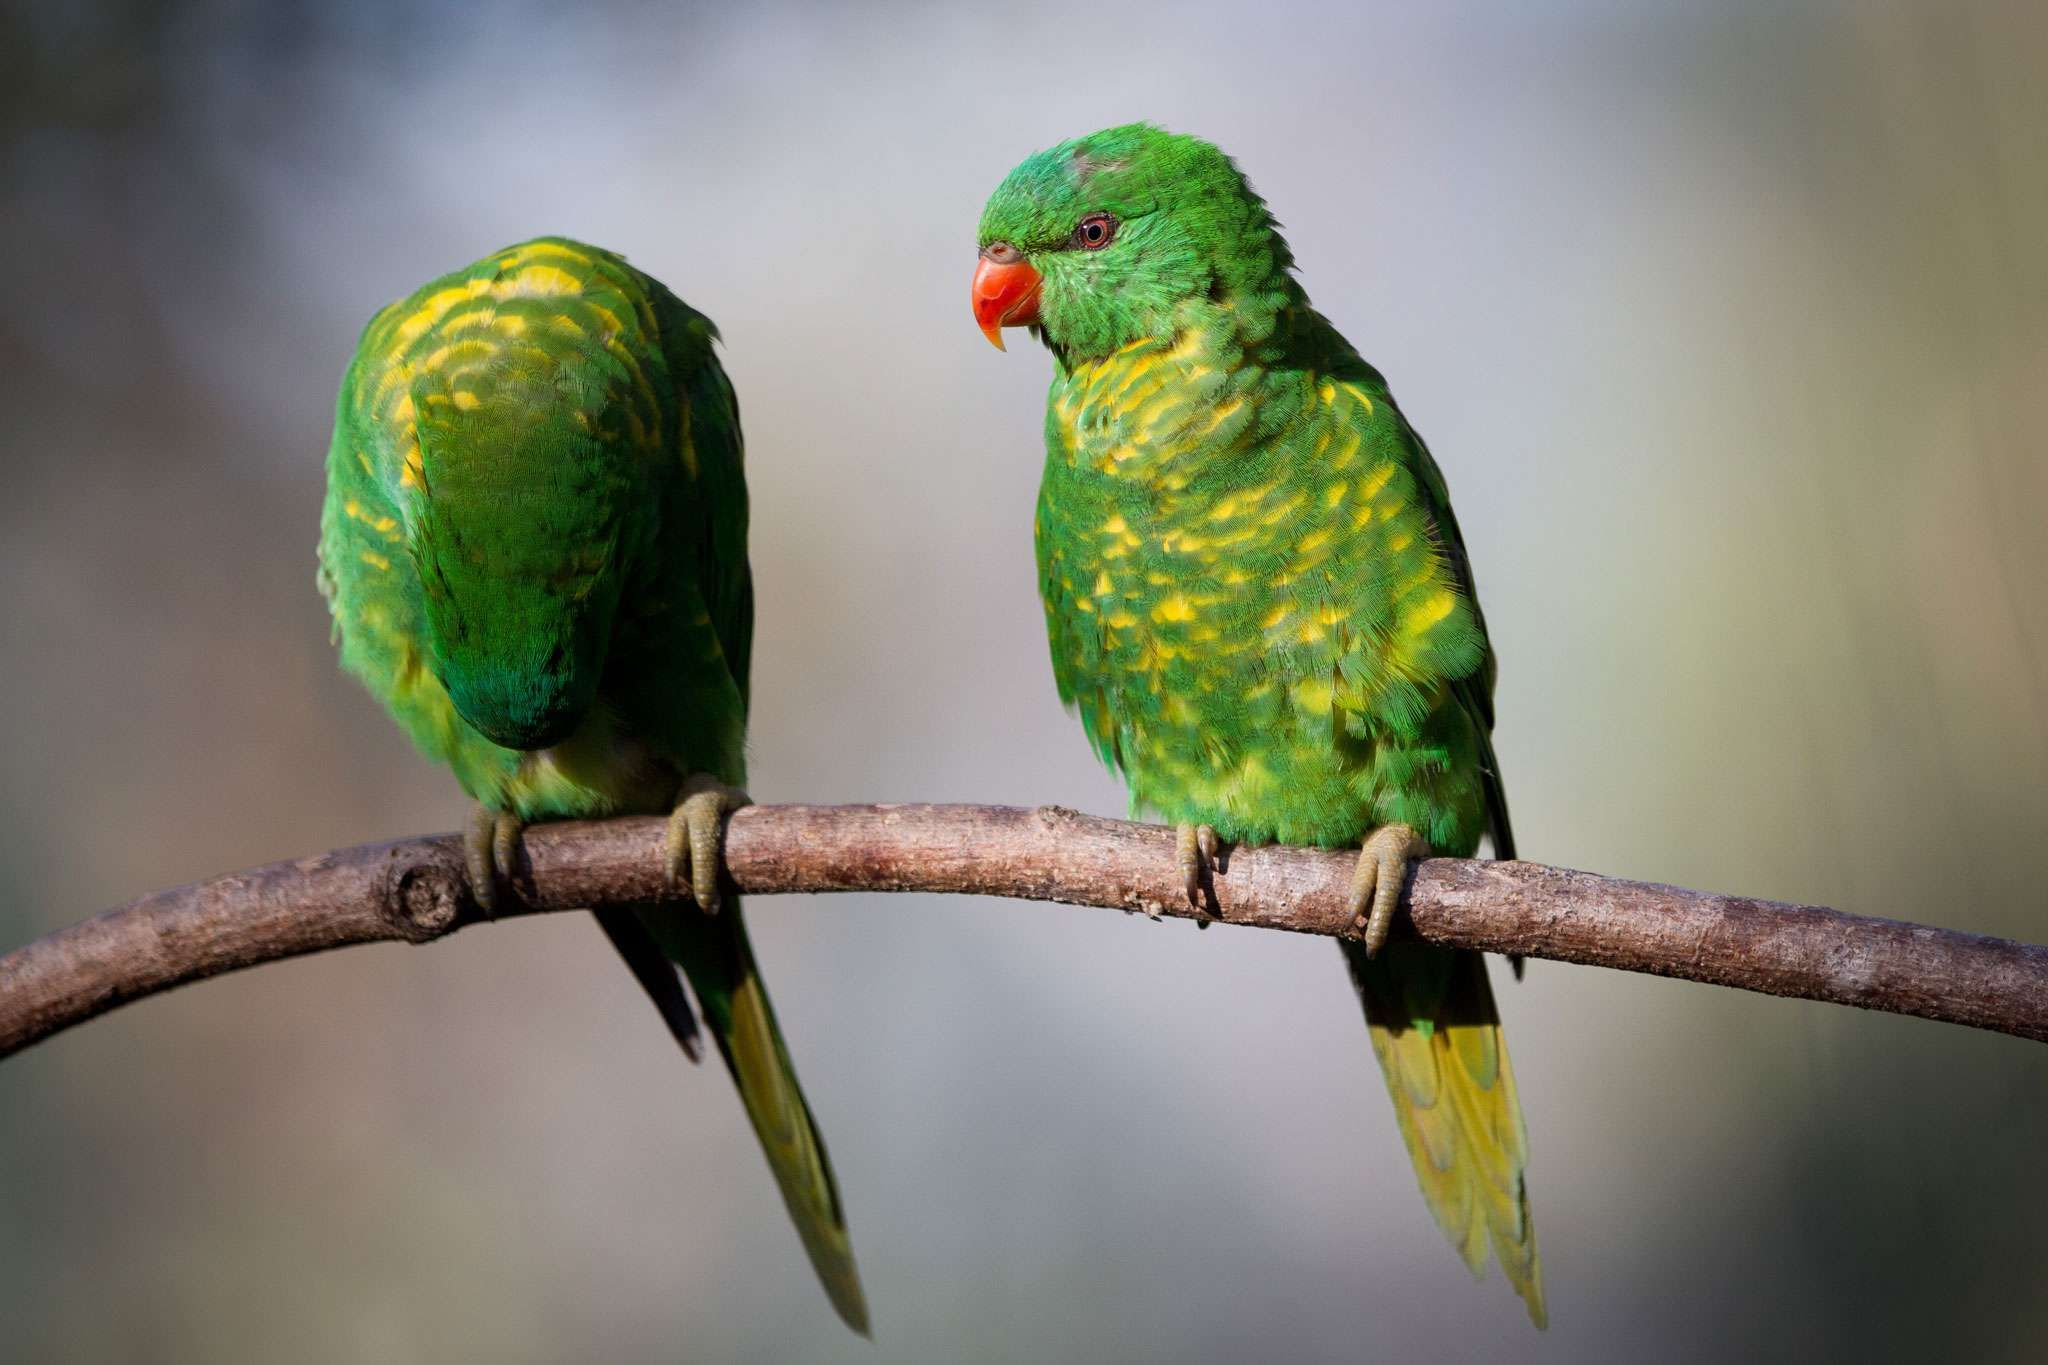 Birds Scaly Breasted Lorikeet2 Jpg 2048 1365 Budgies Colorful Birds Parakeet